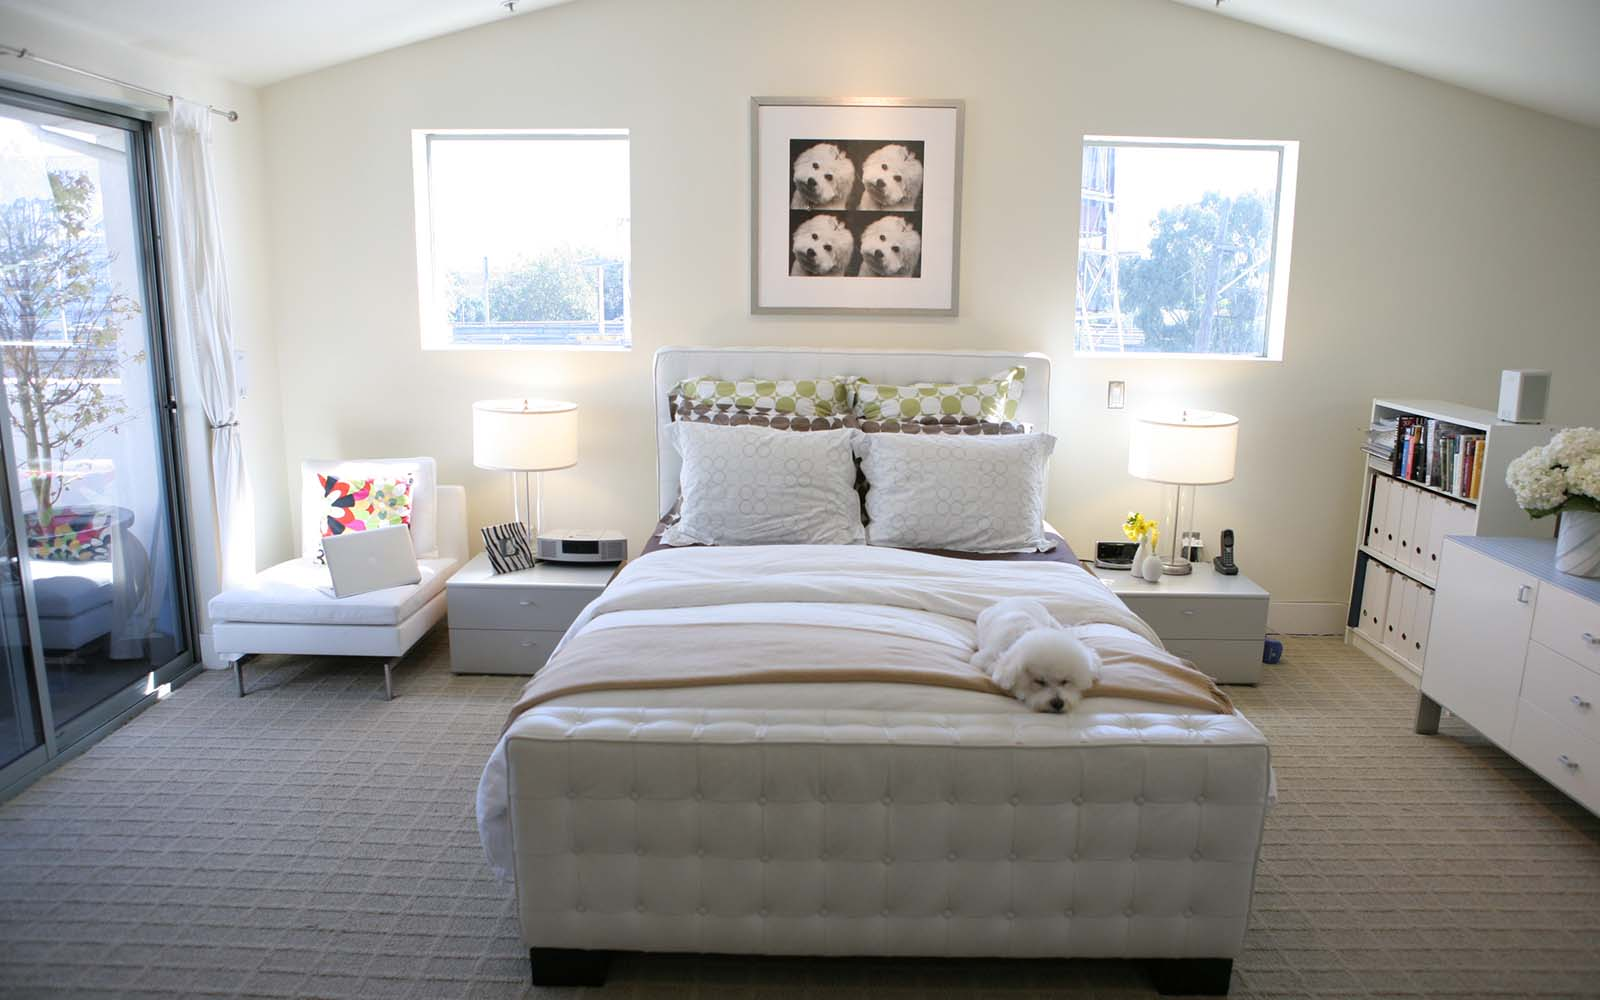 bed room #2